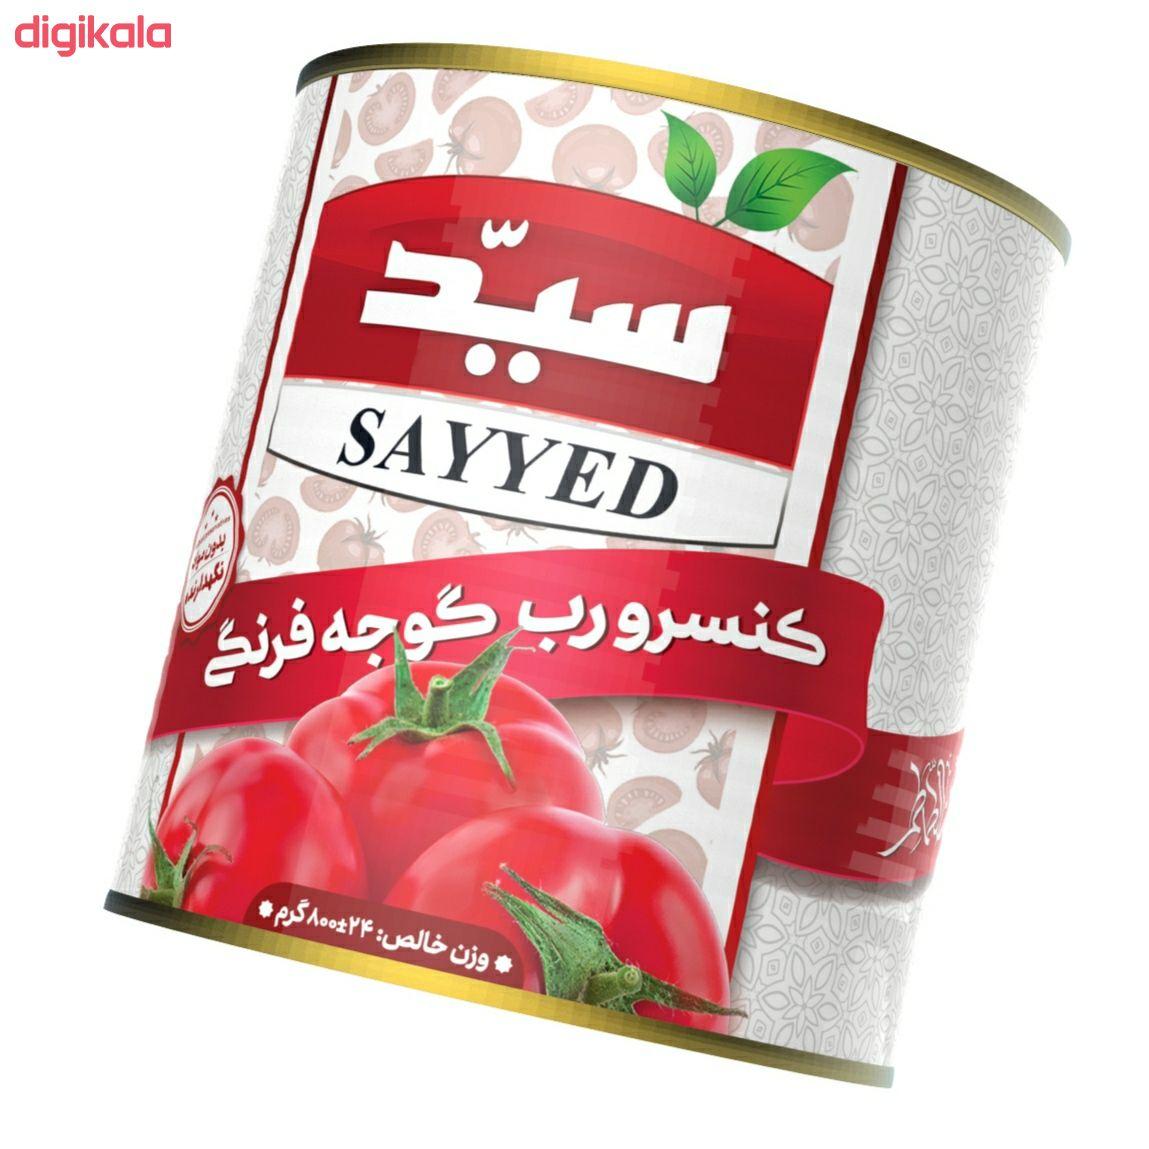 رب گوجه فرنگی سید  - 800 گرم main 1 2